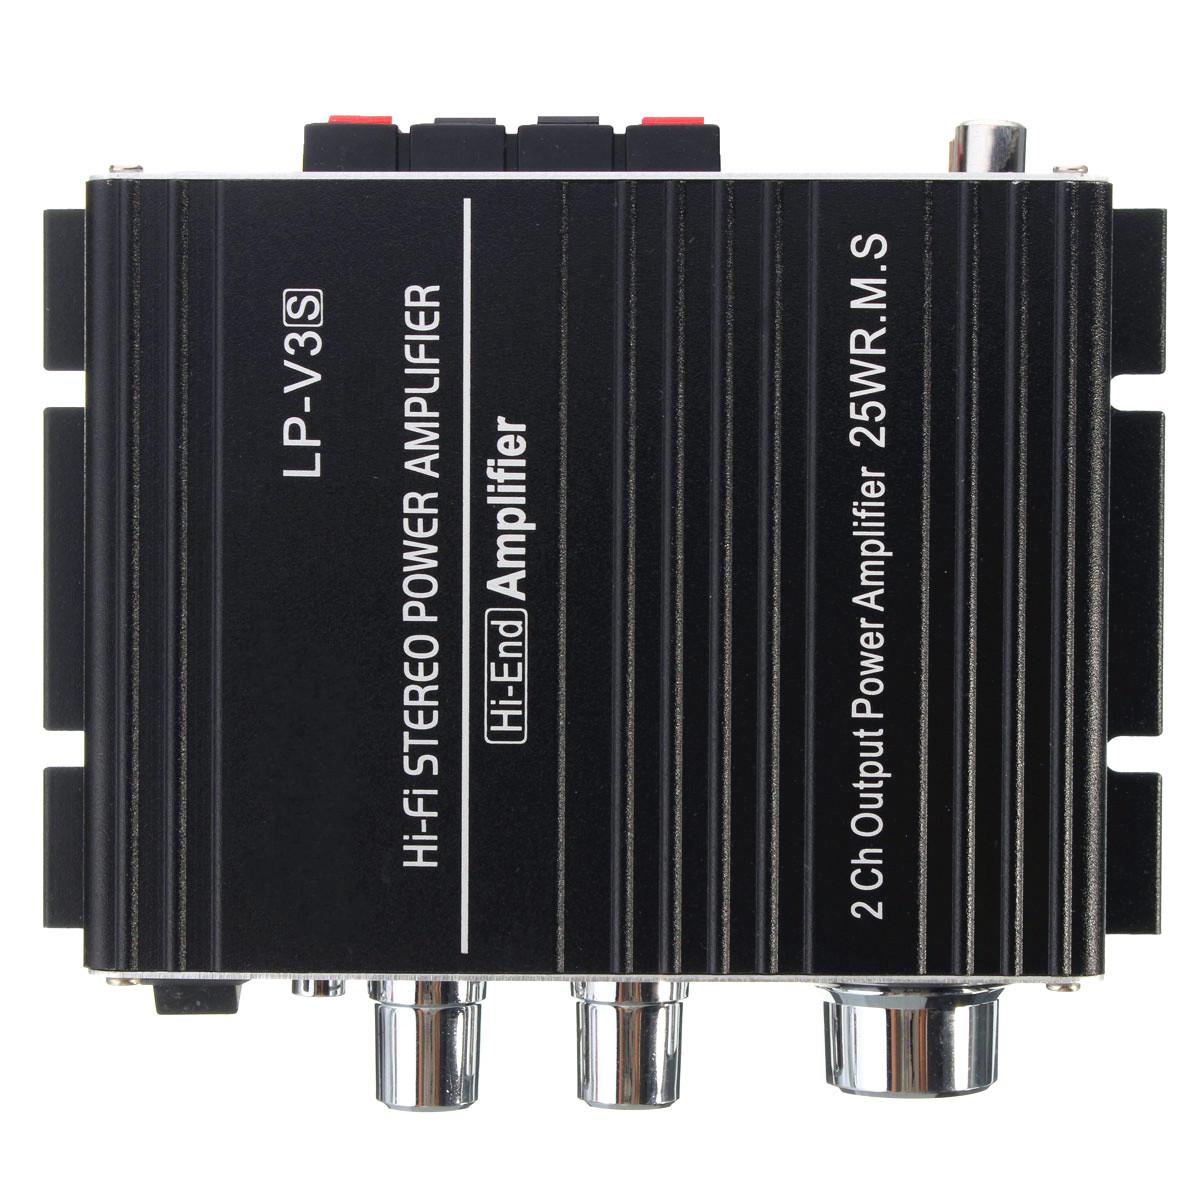 Auto Radio Volume And Tone Control Circuit By Sdfgsa234